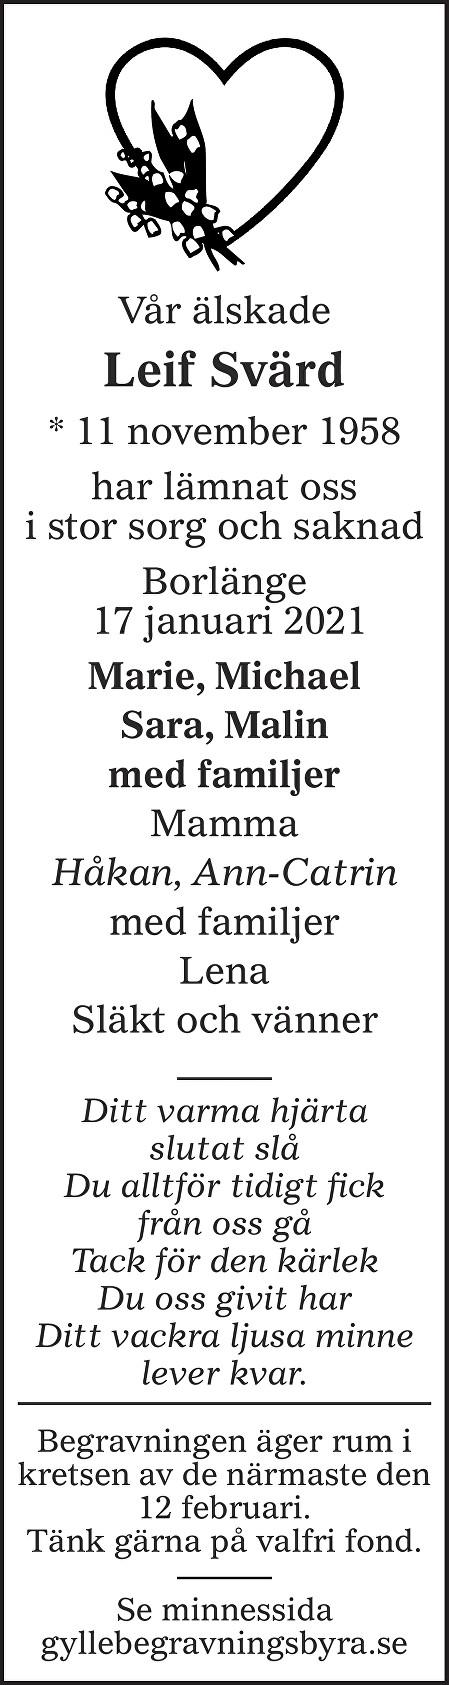 Leif Svärd Death notice